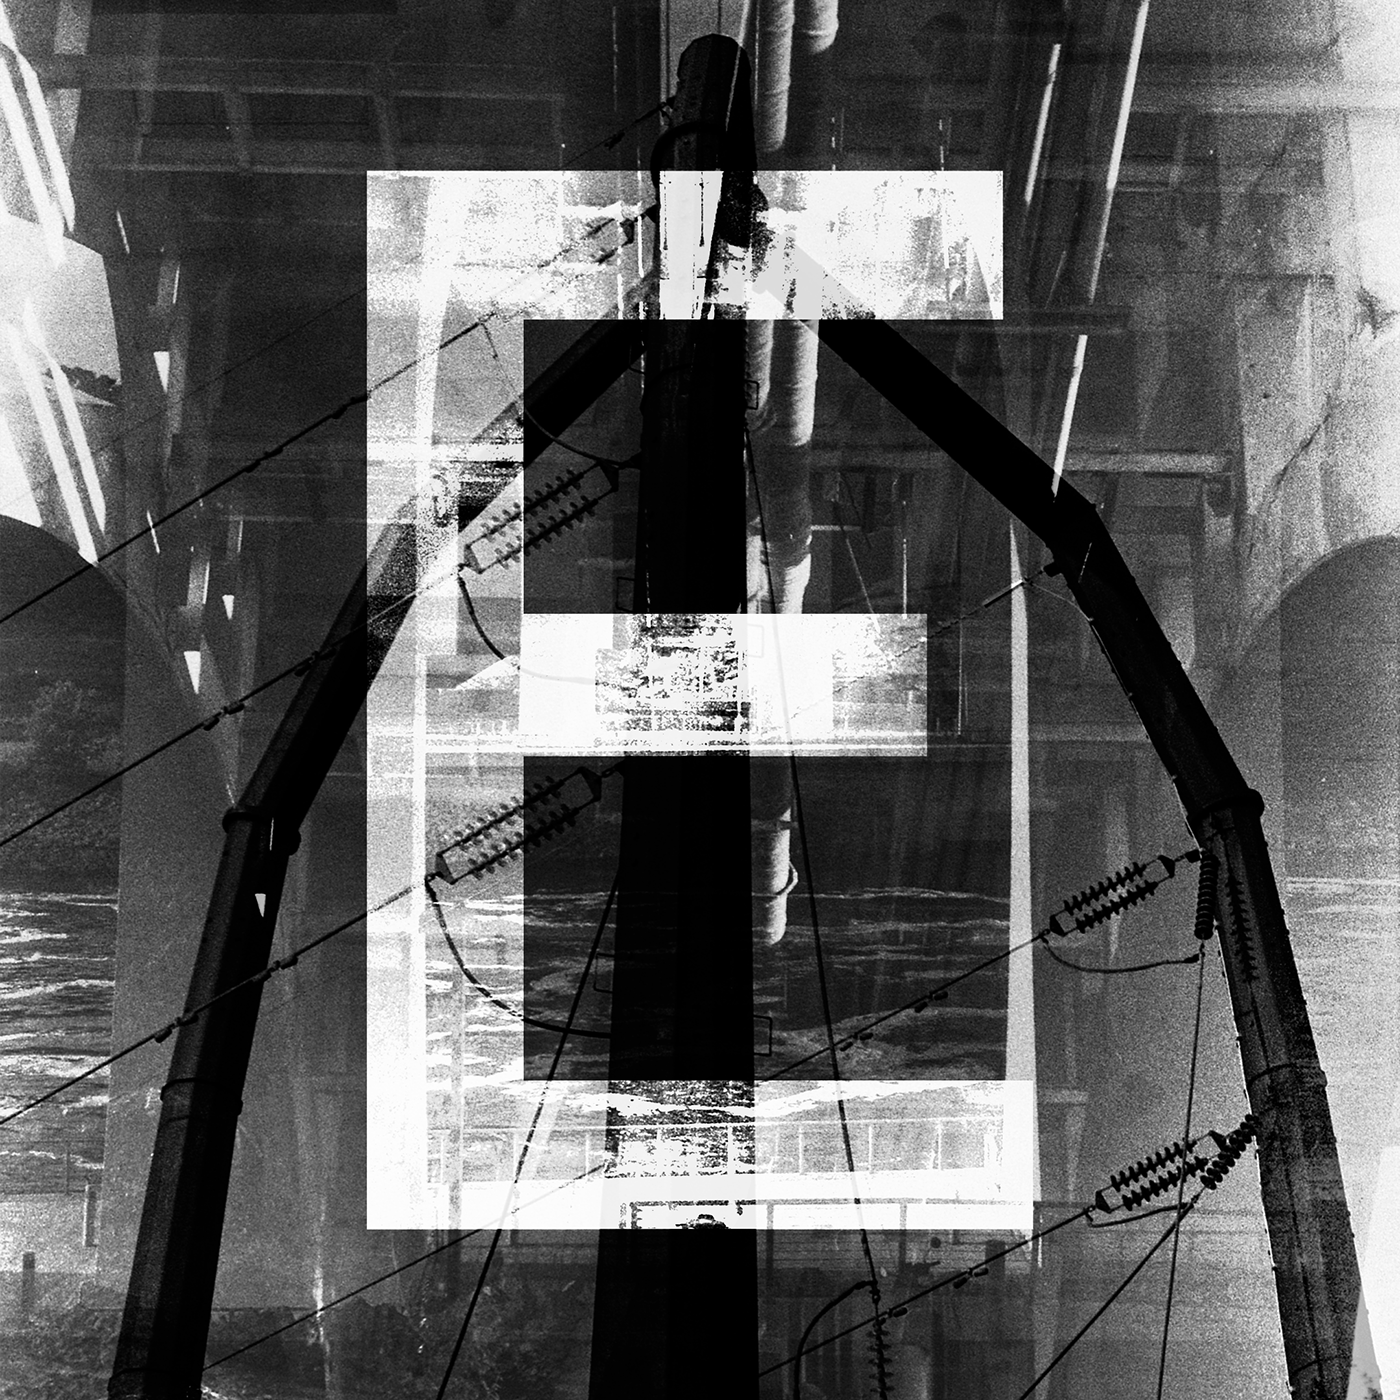 Capital E Photographic Illuminated letter. Film photograph with digital manipulation.